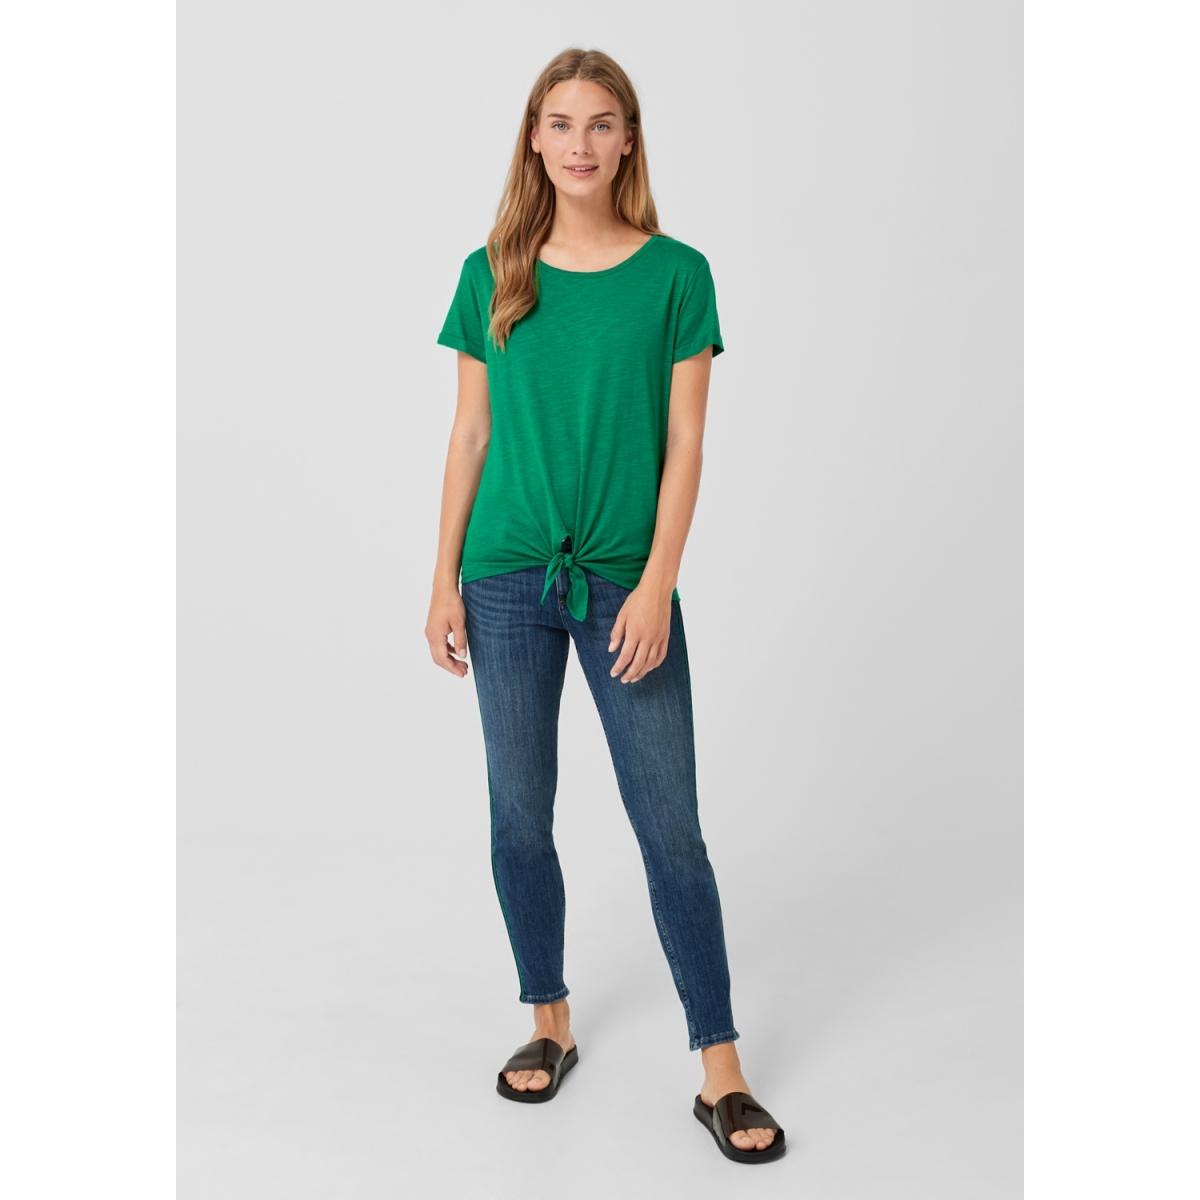 t shirt 21907324551 s.oliver t-shirt 7652